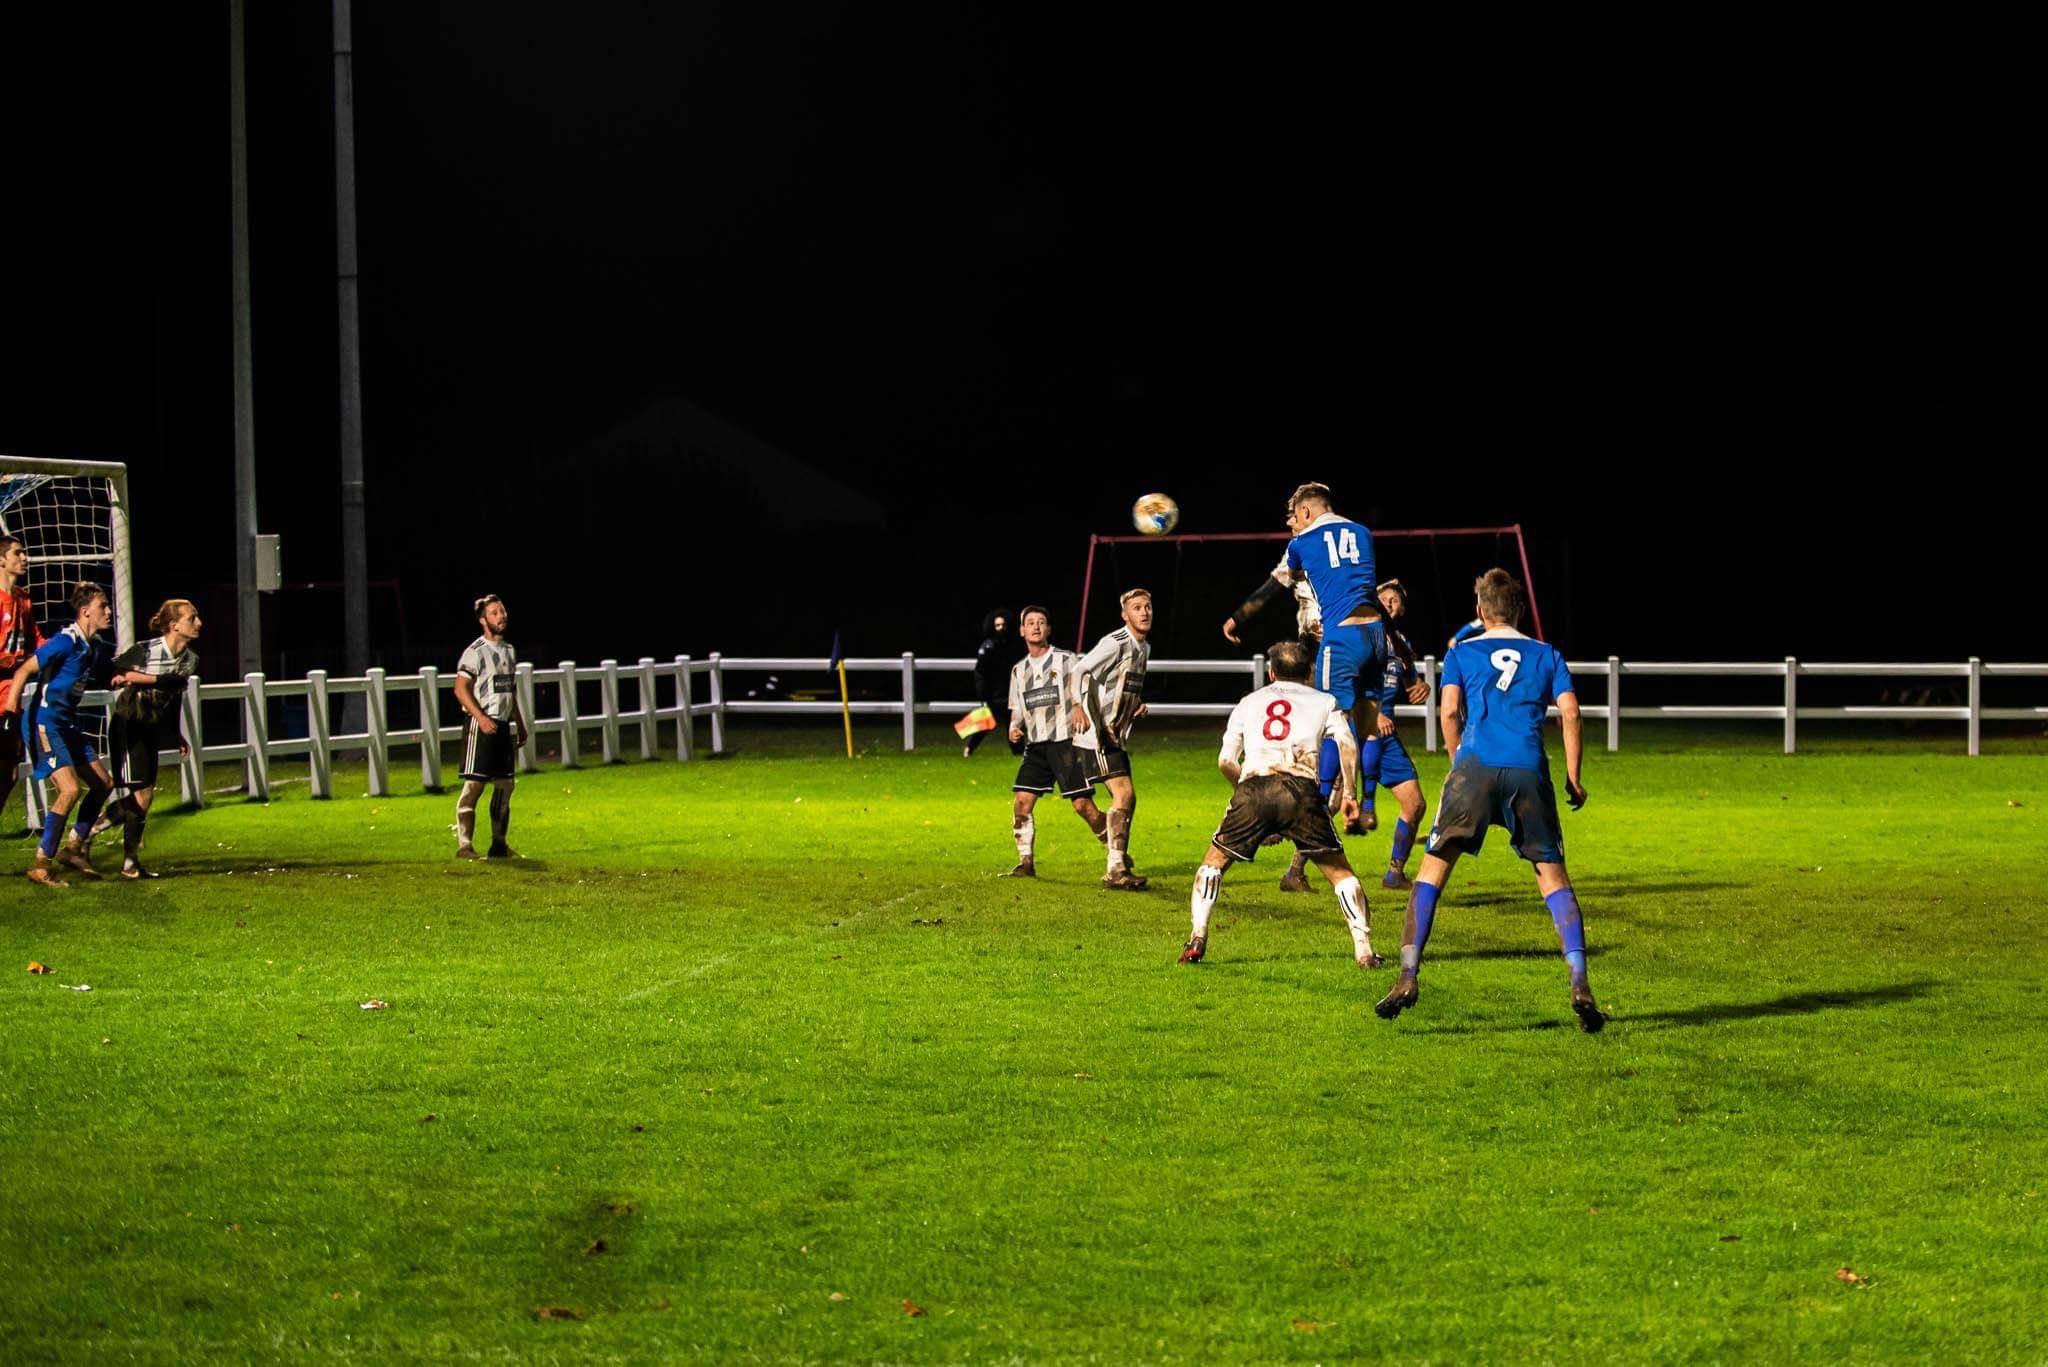 Winscombe AFC - Football LED Lighting